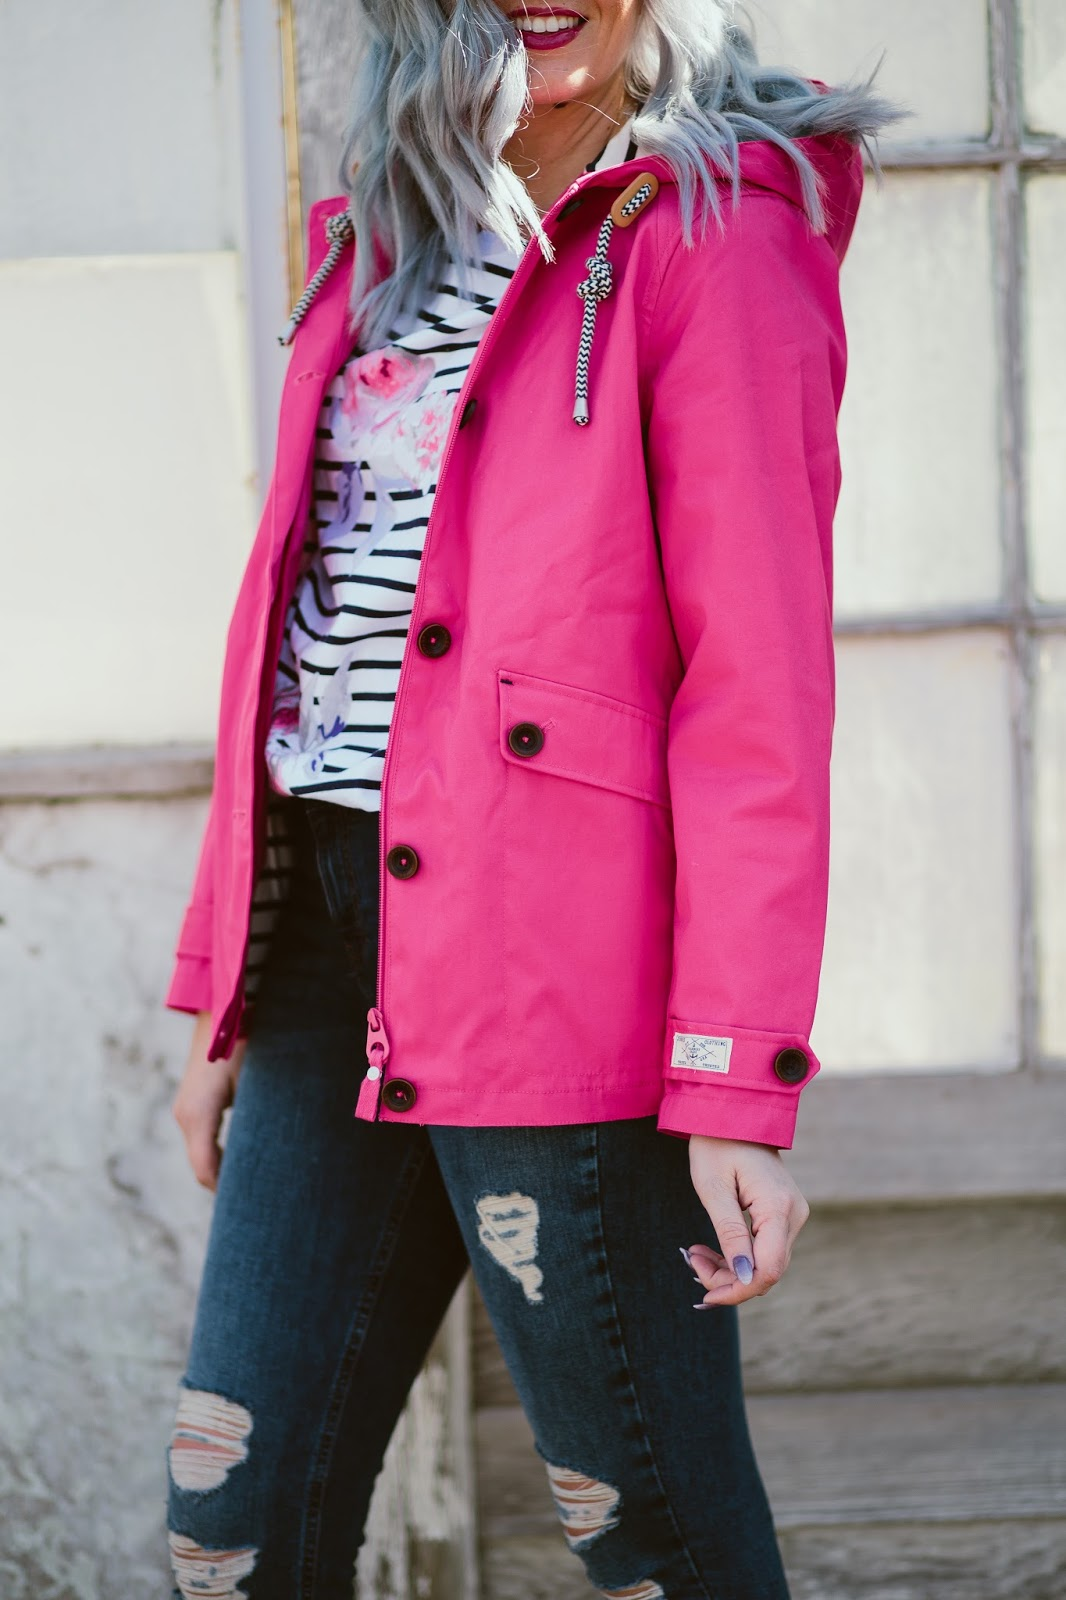 Rain Jacket, Pink Rain Jacket, Rainy Day Outfit